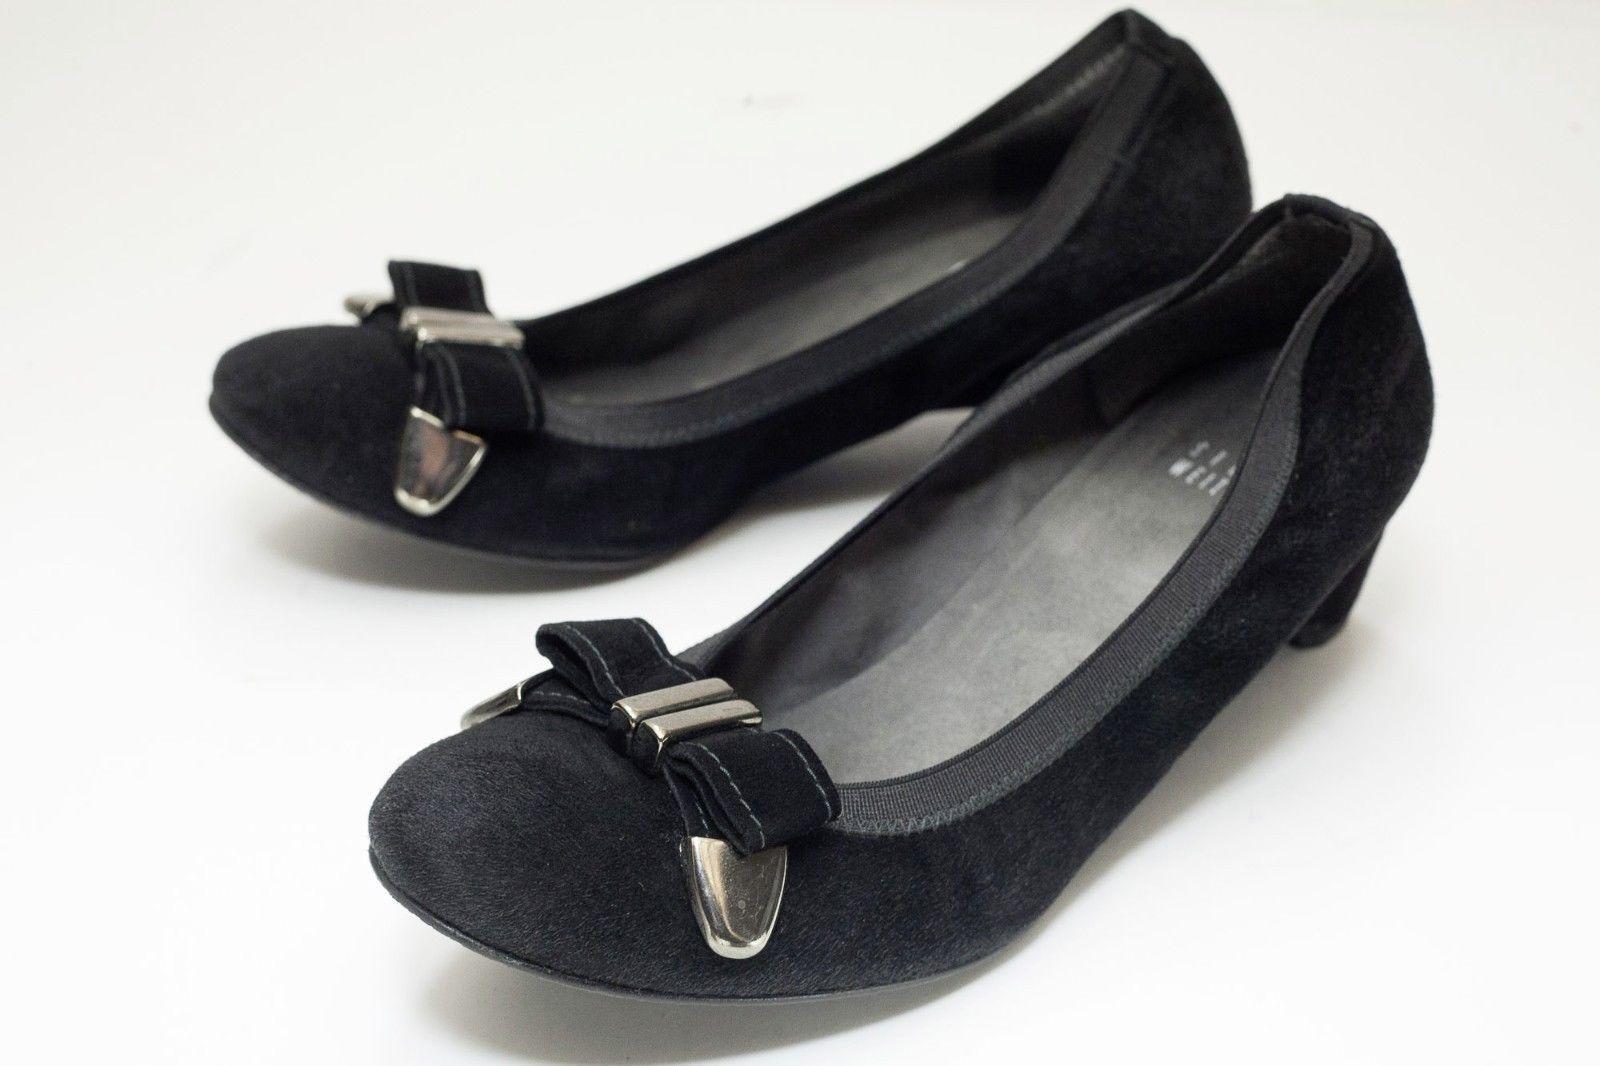 Stuart Weitzman 7 Black Ballet Slip On Shoes Women's - $56.00